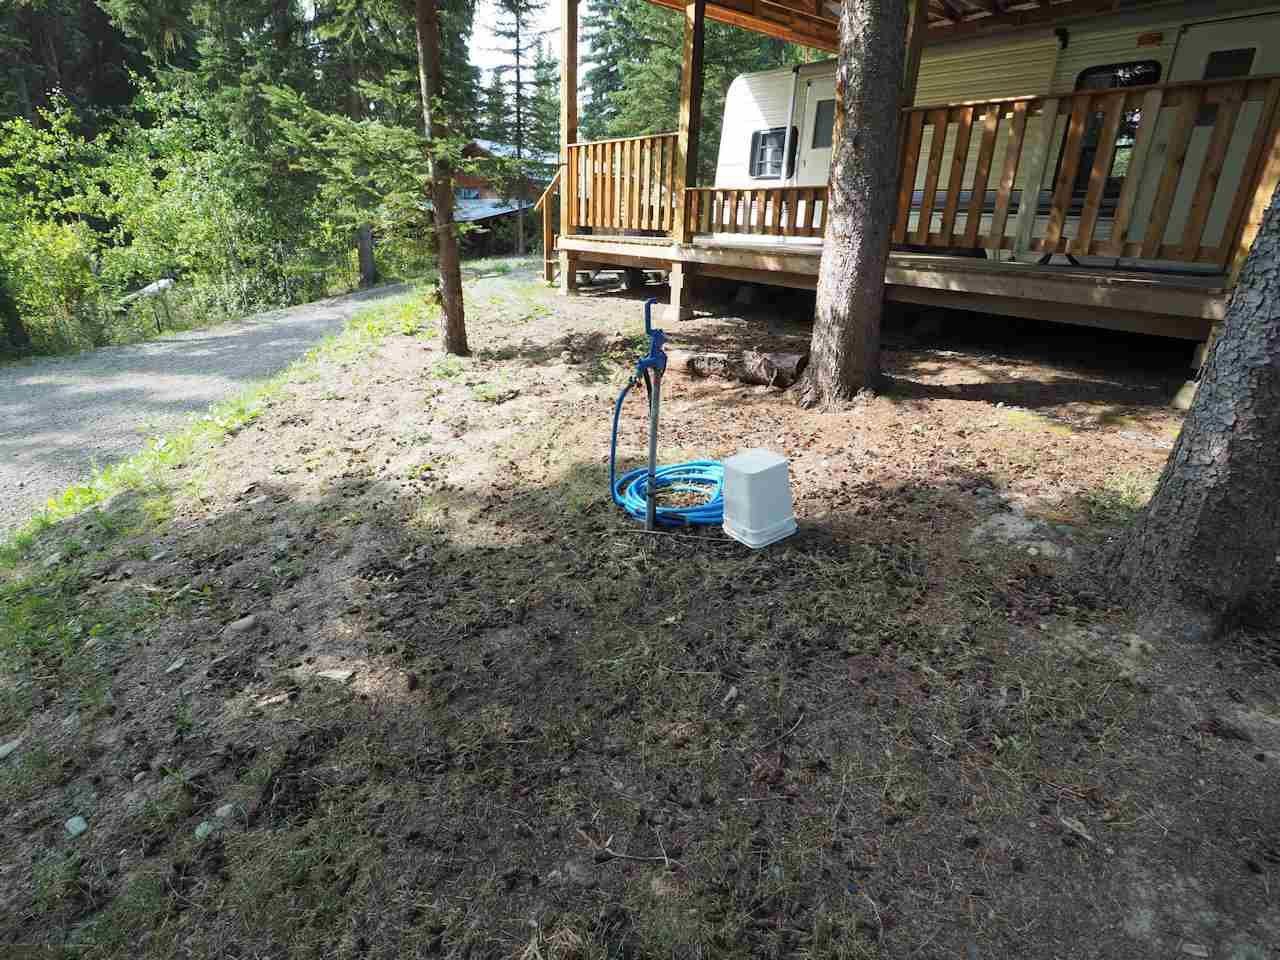 Photo 15: Photos: 7271 NATH Road in Bridge Lake: Bridge Lake/Sheridan Lake Land for sale (100 Mile House (Zone 10))  : MLS®# R2496086